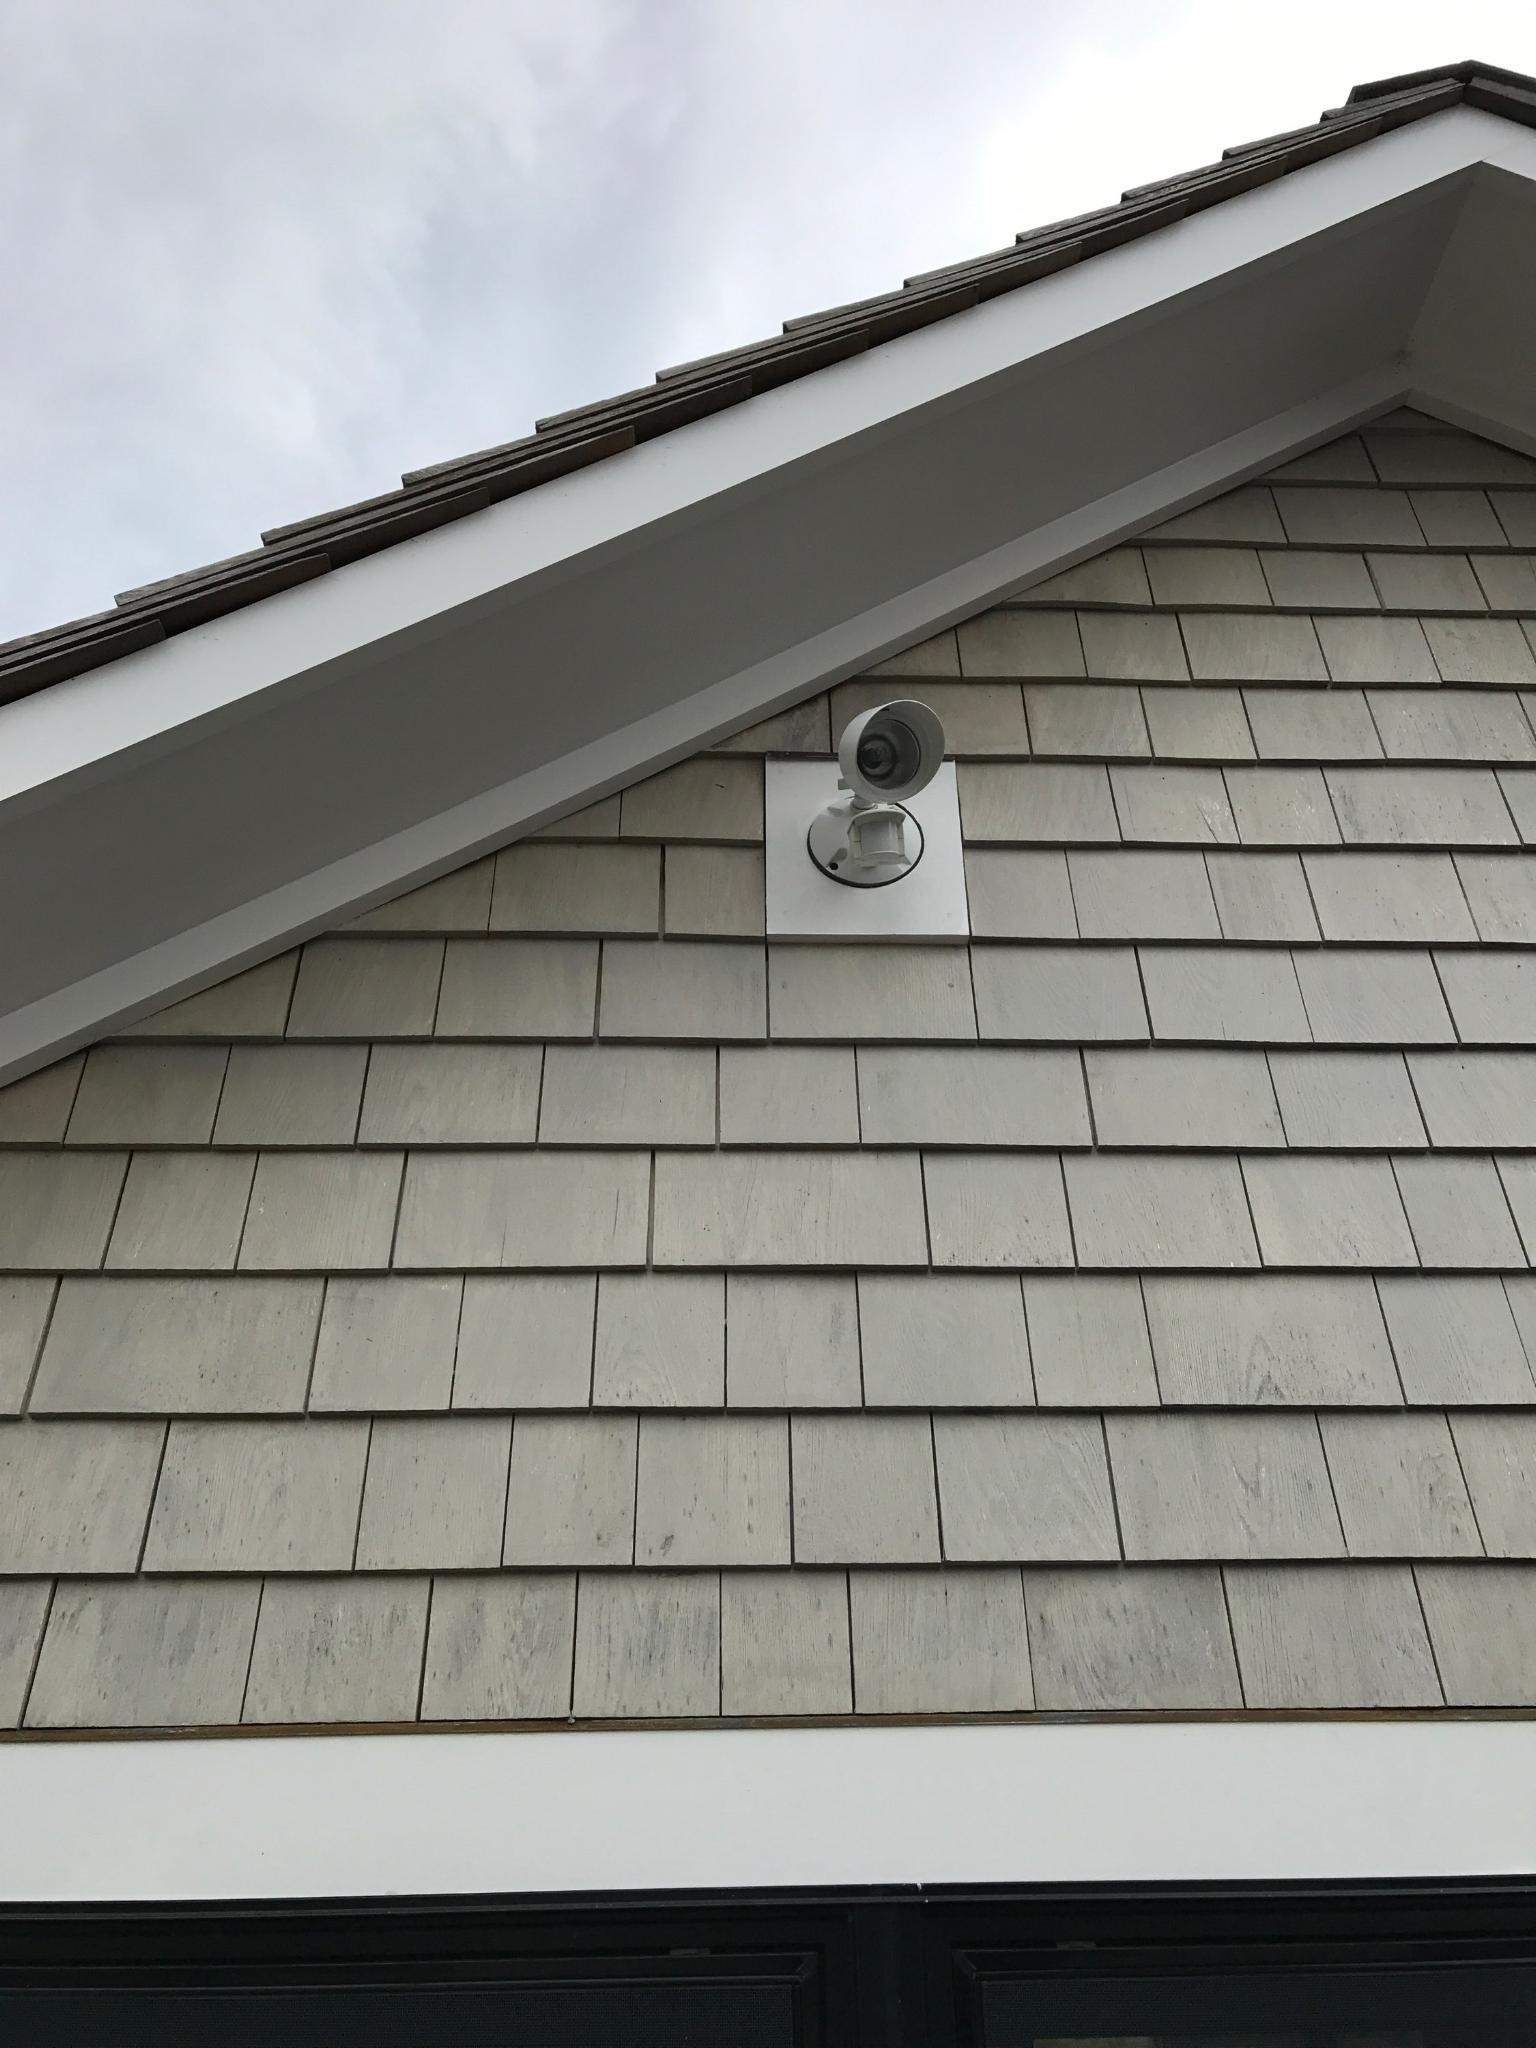 camera security wiring